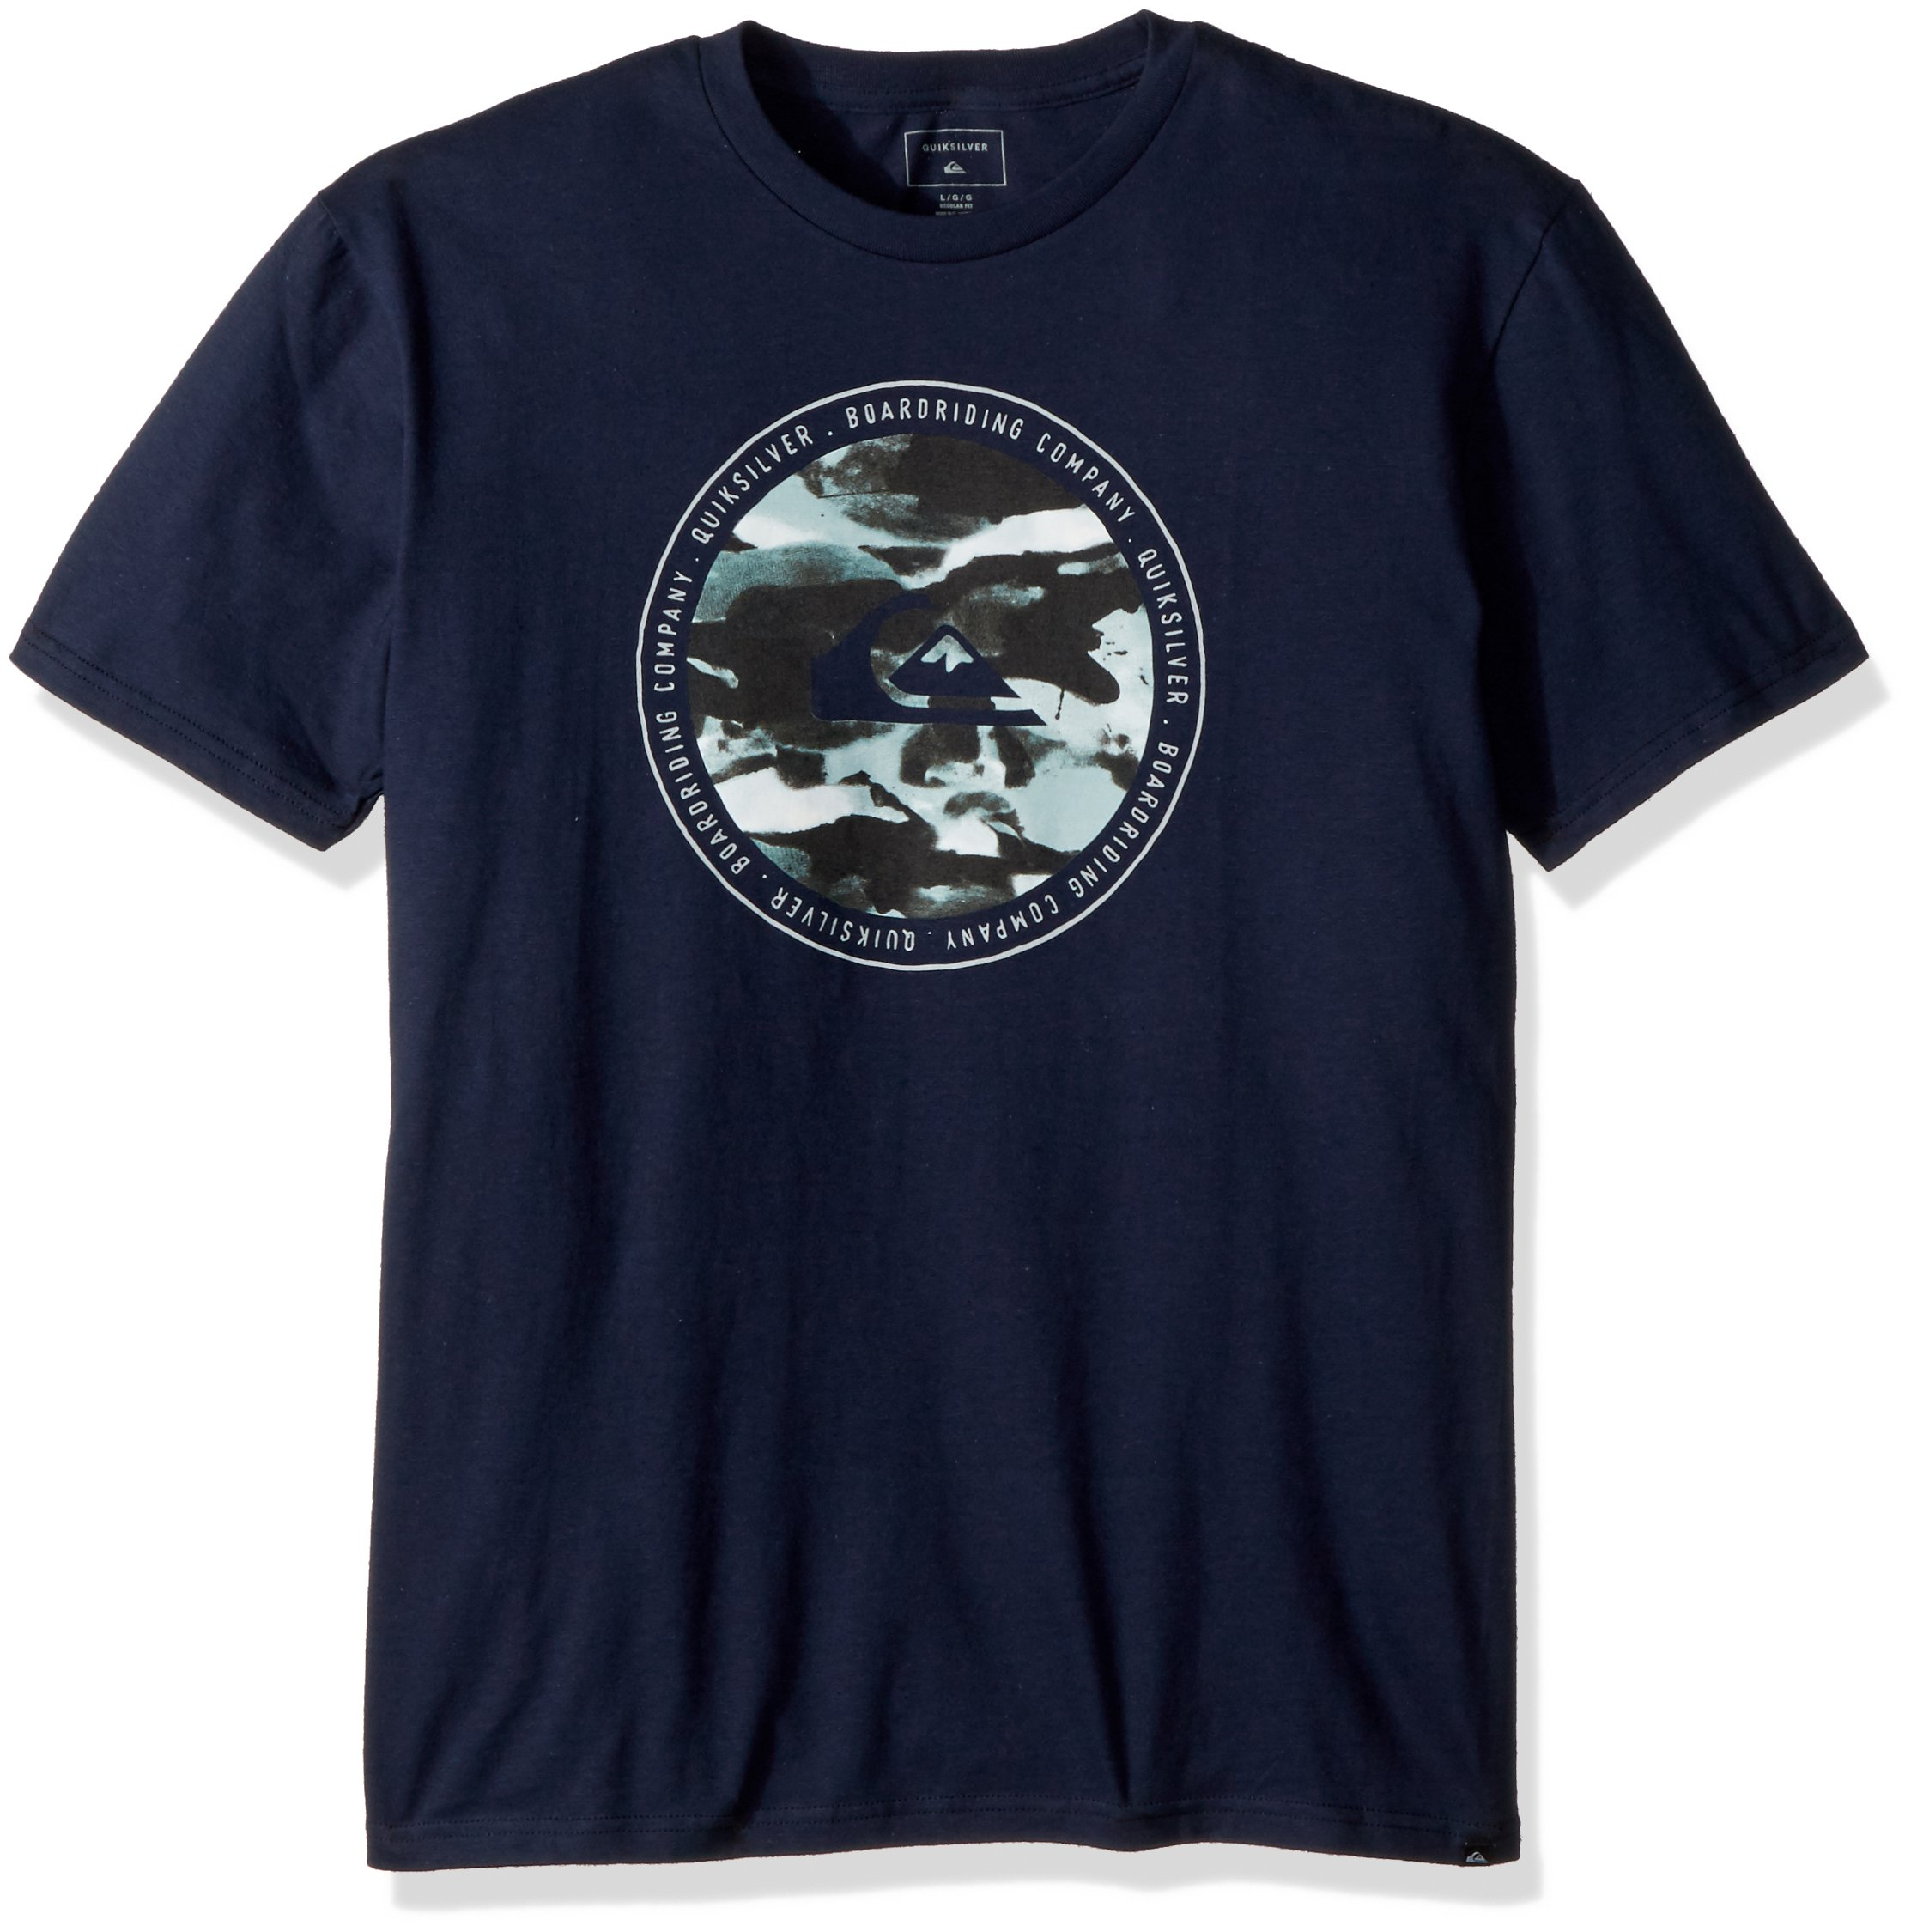 Quiksilver Men's Resin Feel T-Shirt, Navy Blazer, M